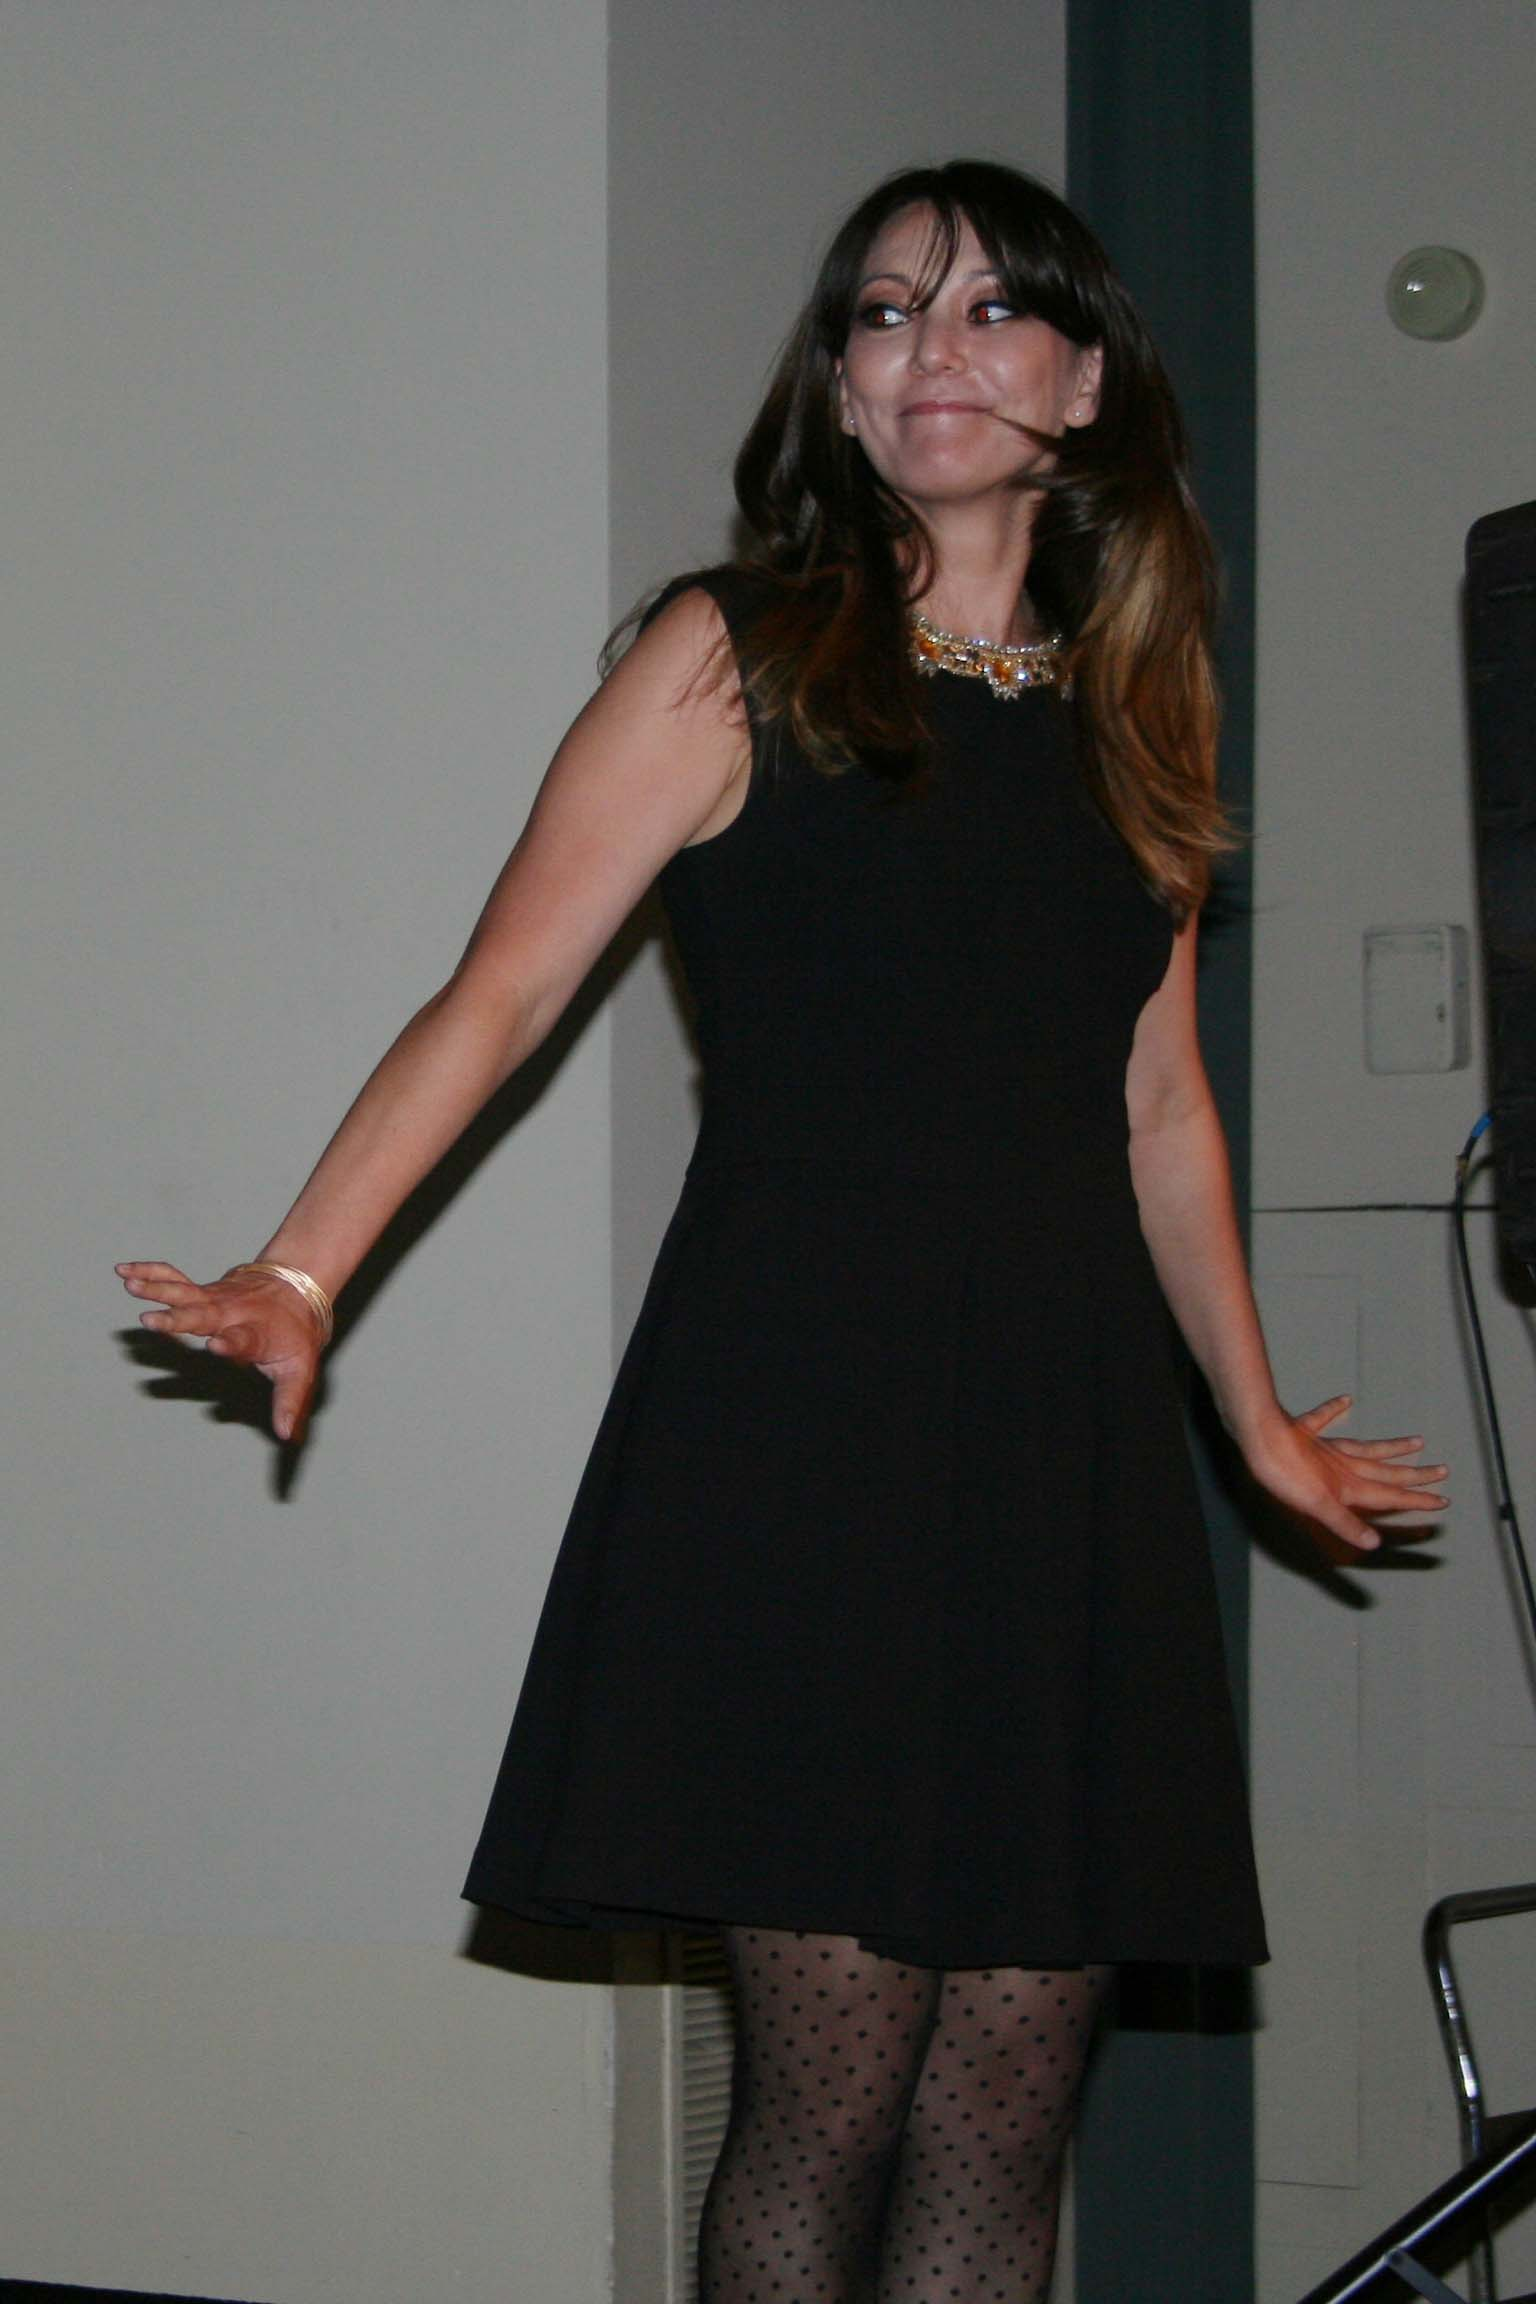 Kim Sullivan, a colon cancer survivor, wears a black Tracey Reese dress with a gold embroidered neckline. (Photo: Mark Heckathorn/DC on Heels)